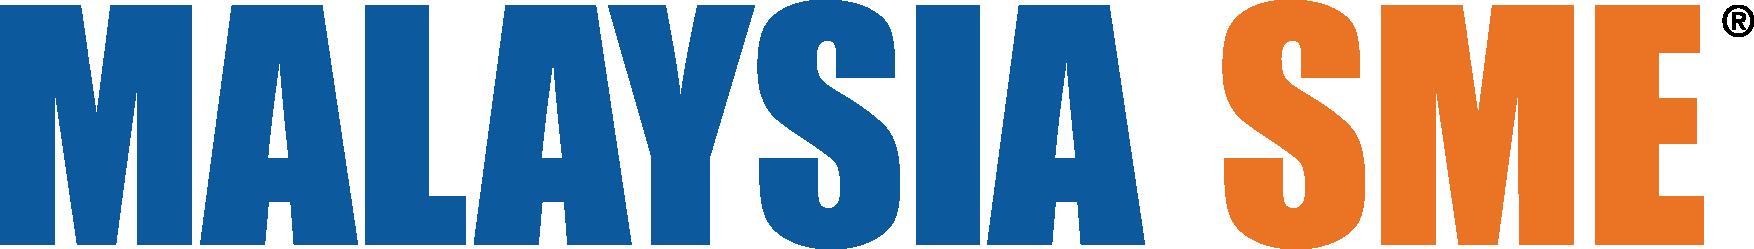 gtimedia gradmalaysia malaysiasme logo 2019